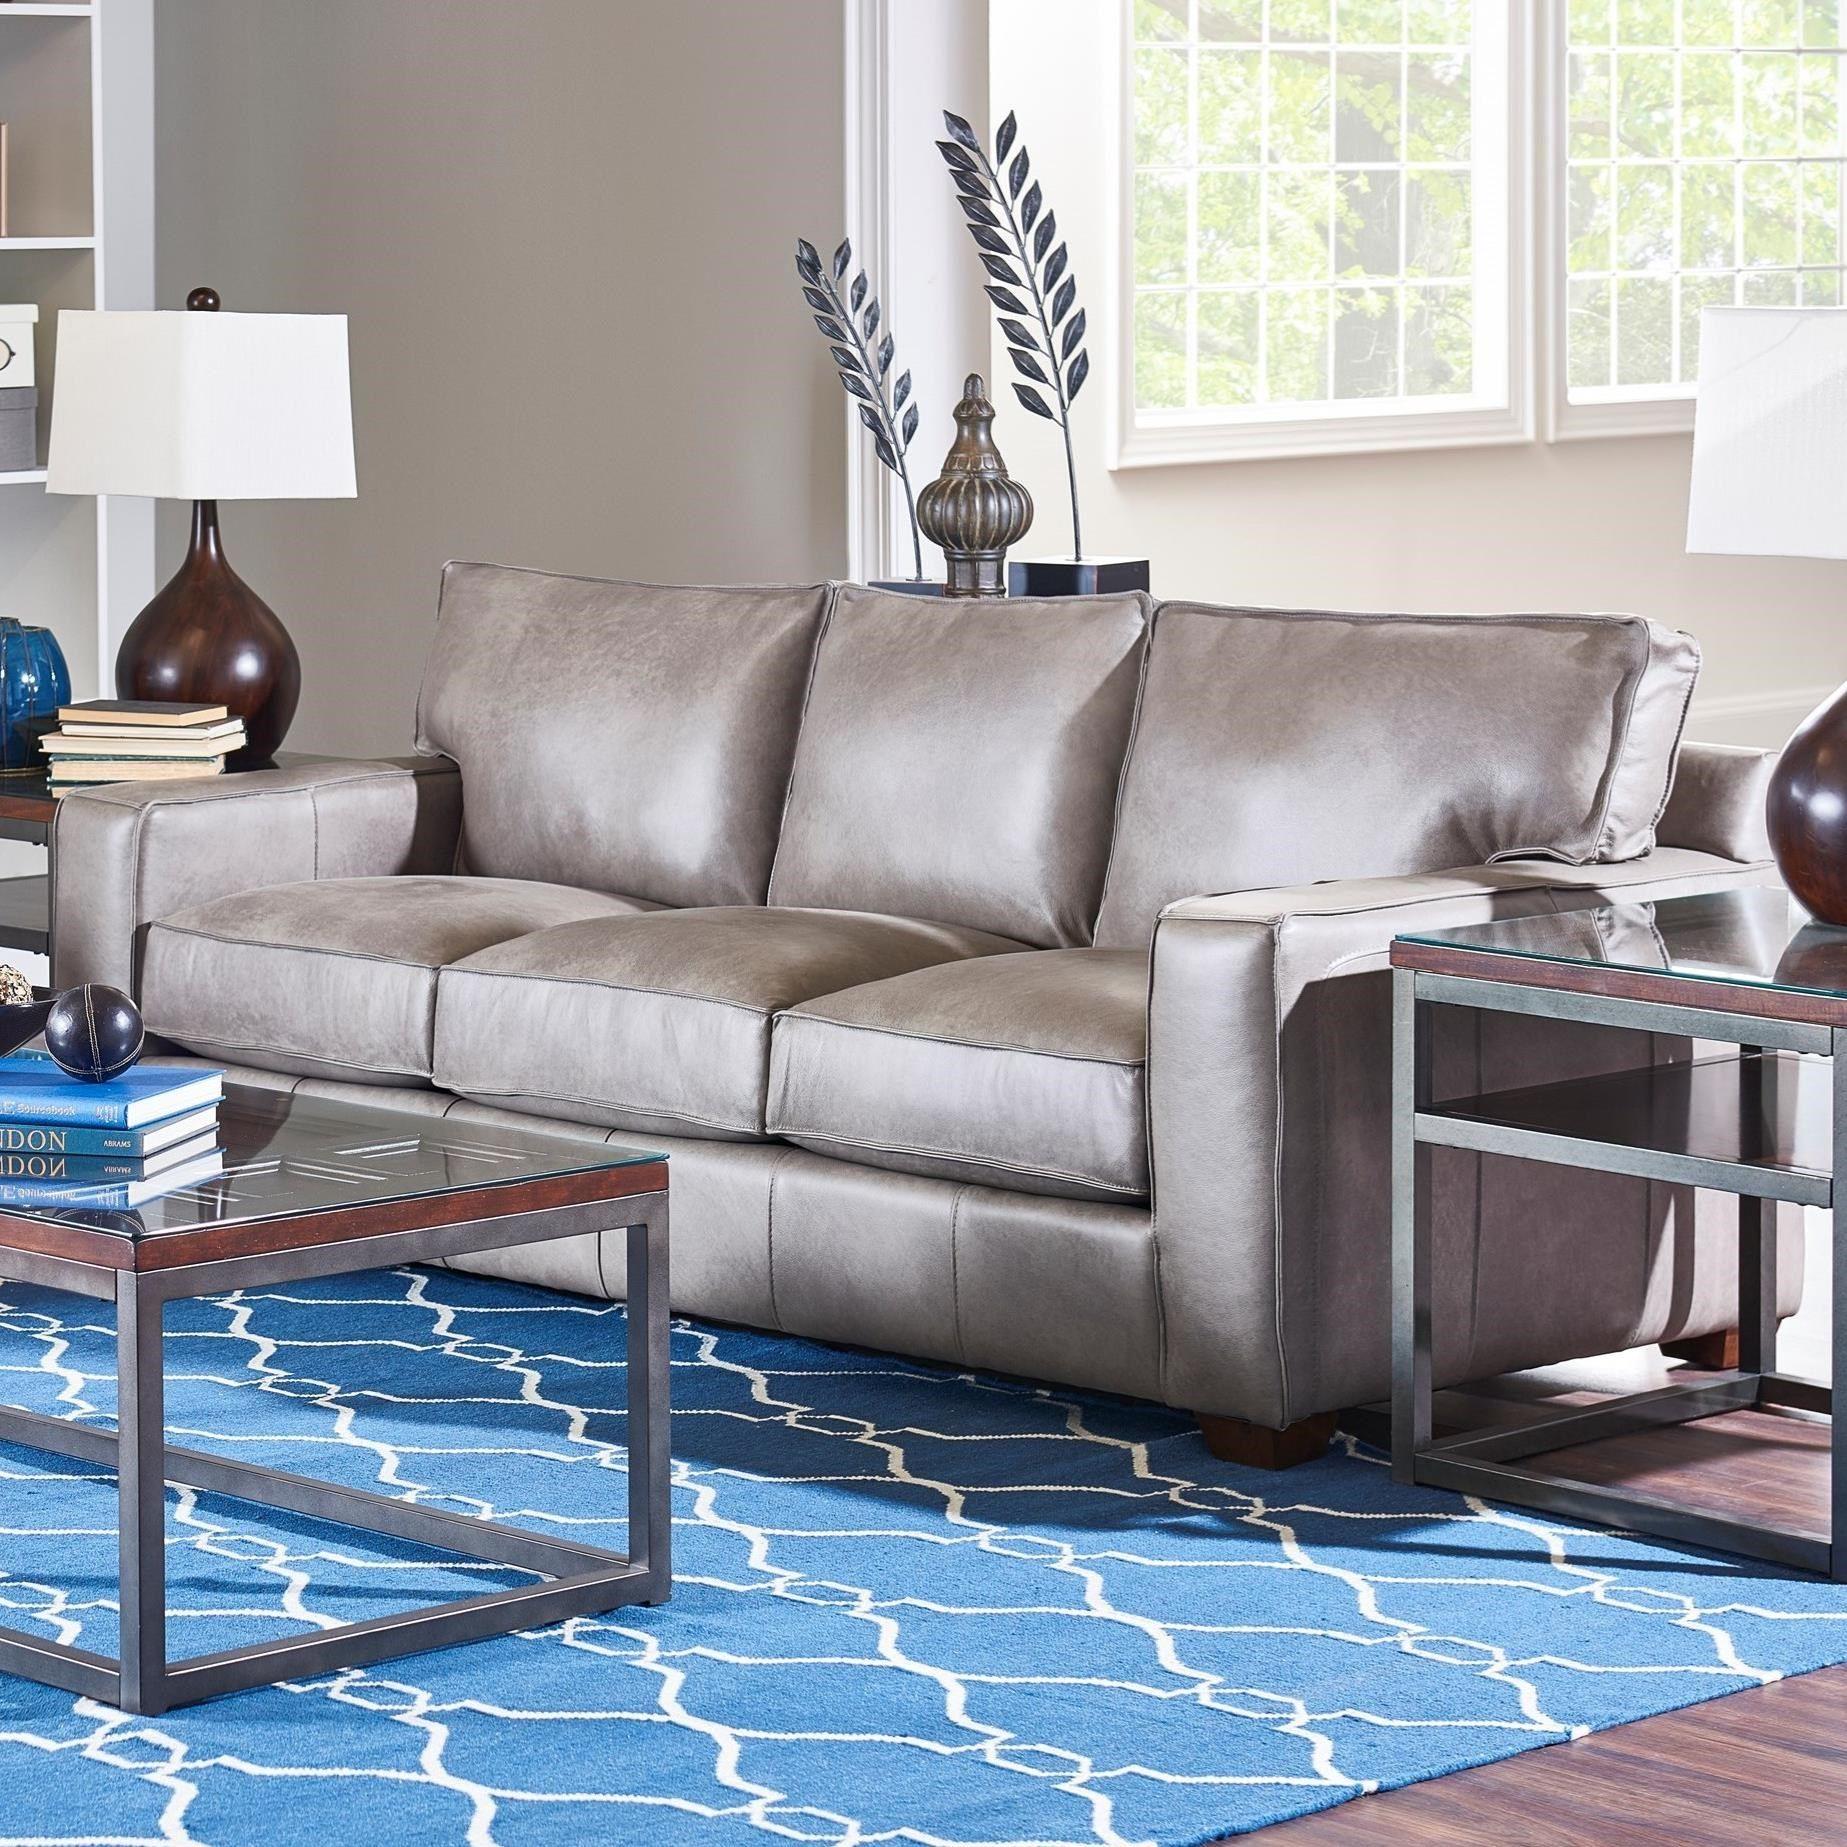 Tillery Sofa By Klaussner At Hudsonu0027s Furniture